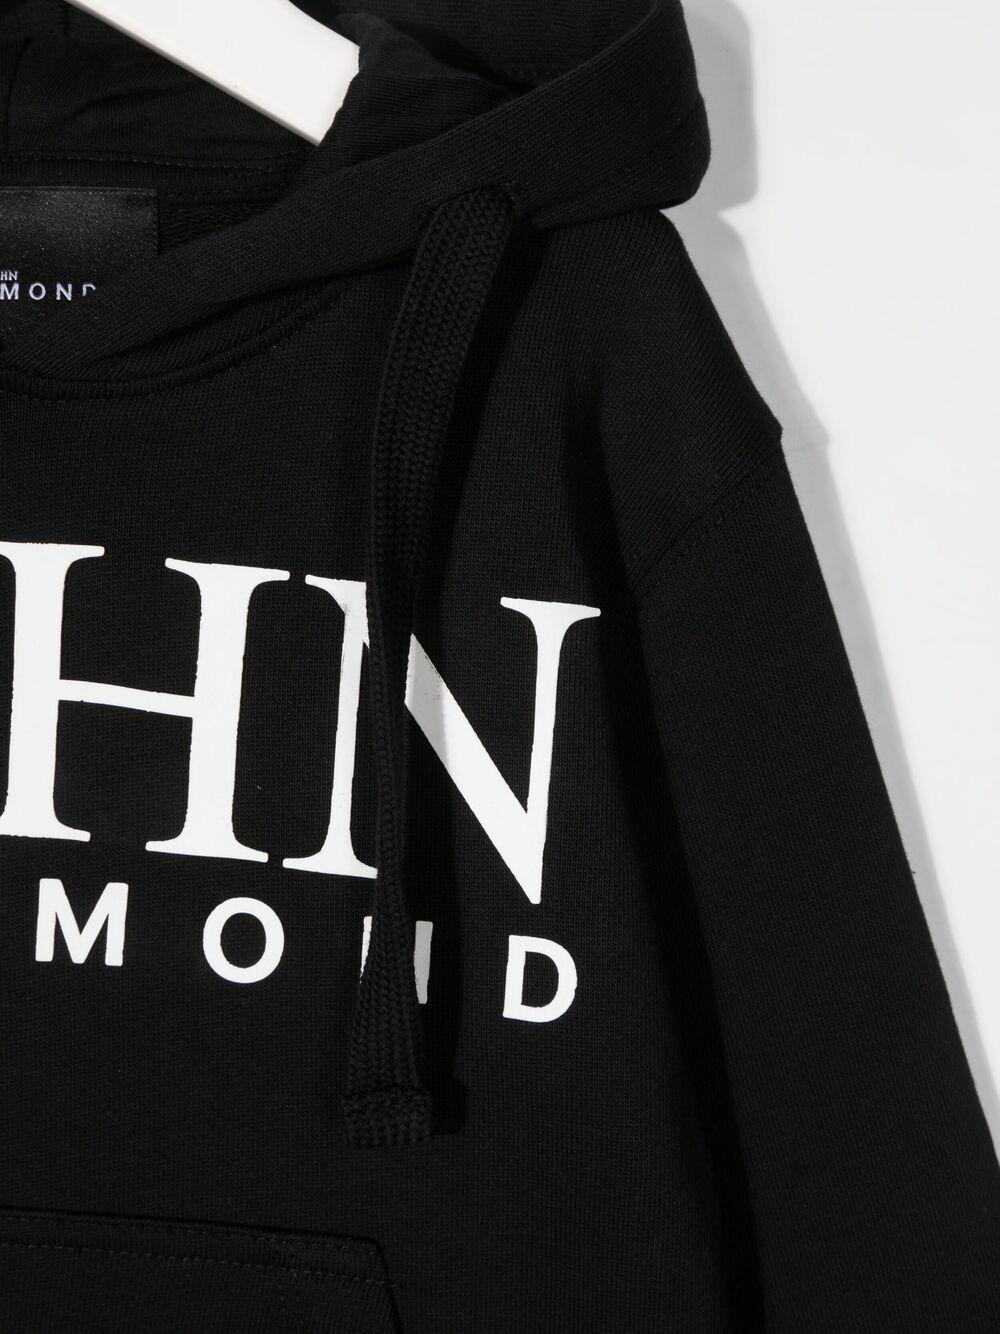 john richmond felpa cappuccio con stampa logo john richmond | Felpa | RBP21048FEW3079